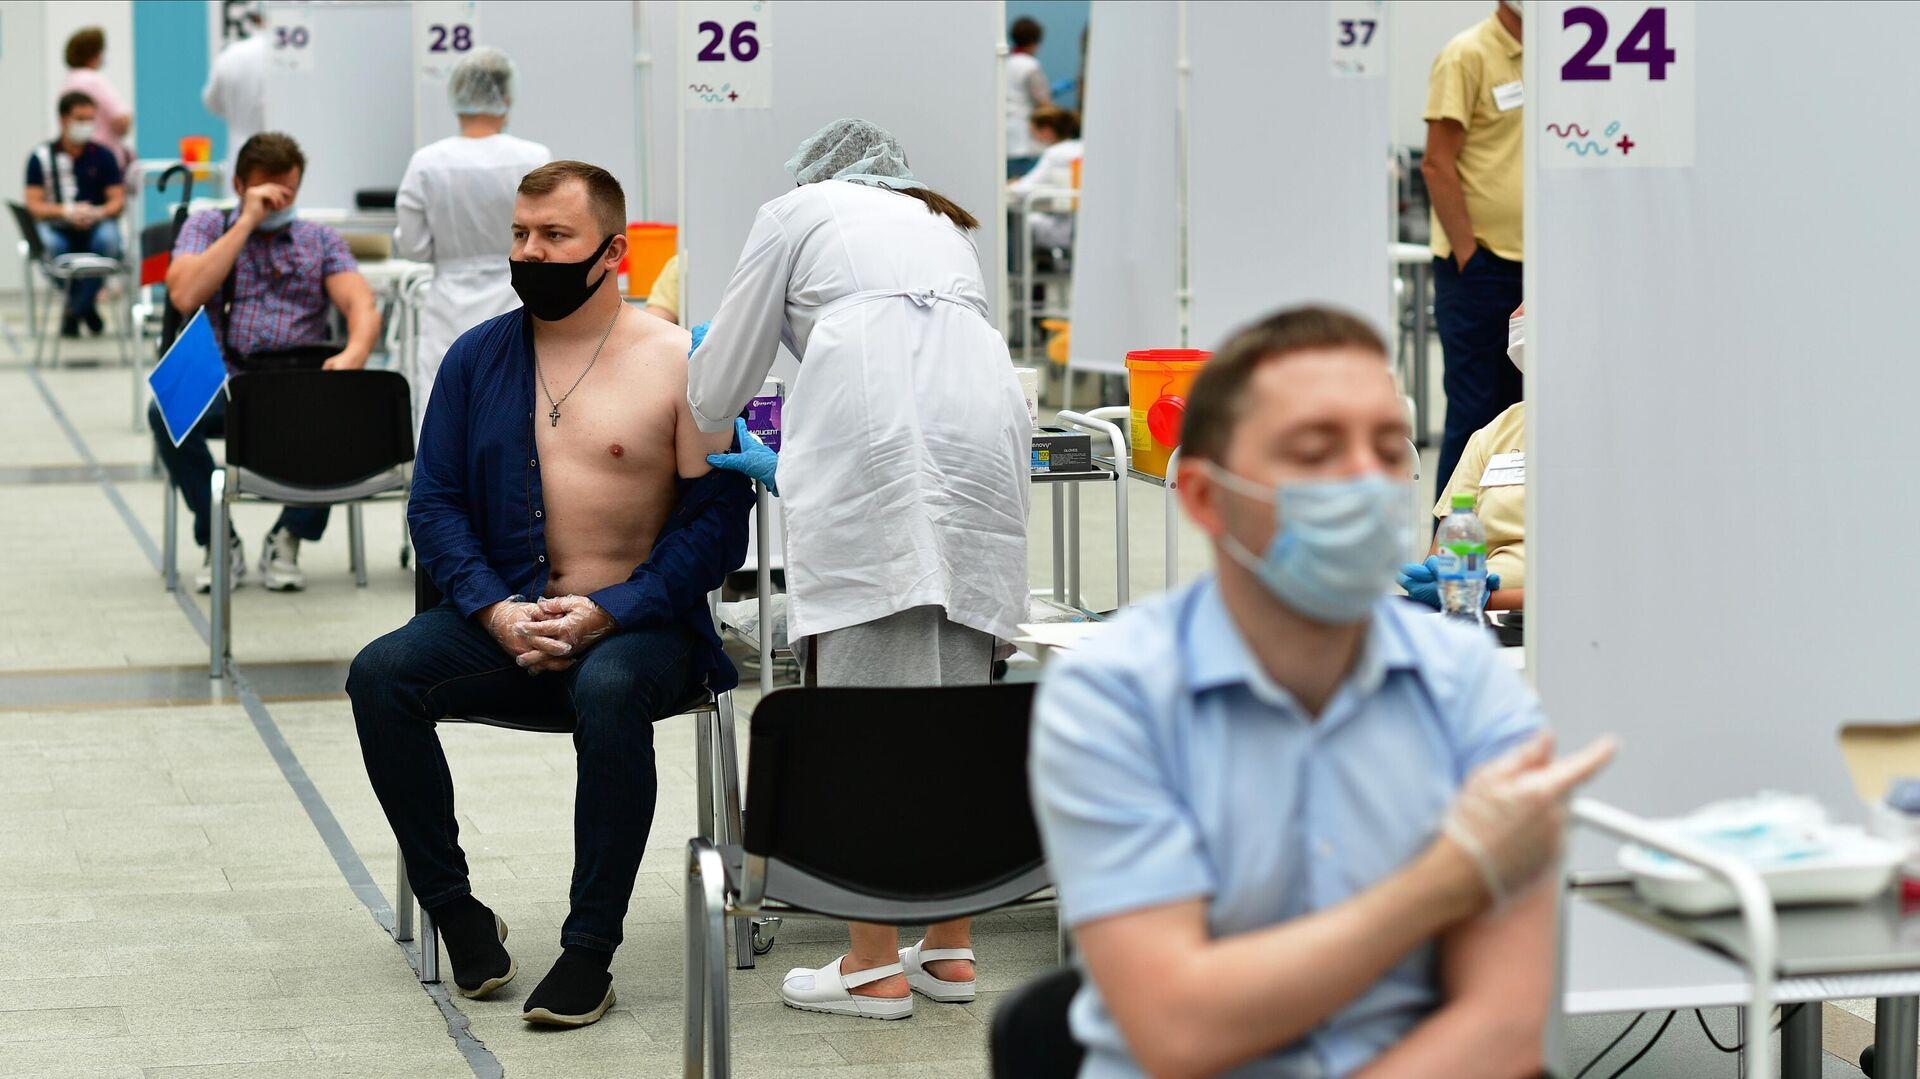 Посетители делают прививки в центре вакцинации от COVID-19 в Гостином дворе в Москве - РИА Новости, 1920, 01.08.2021